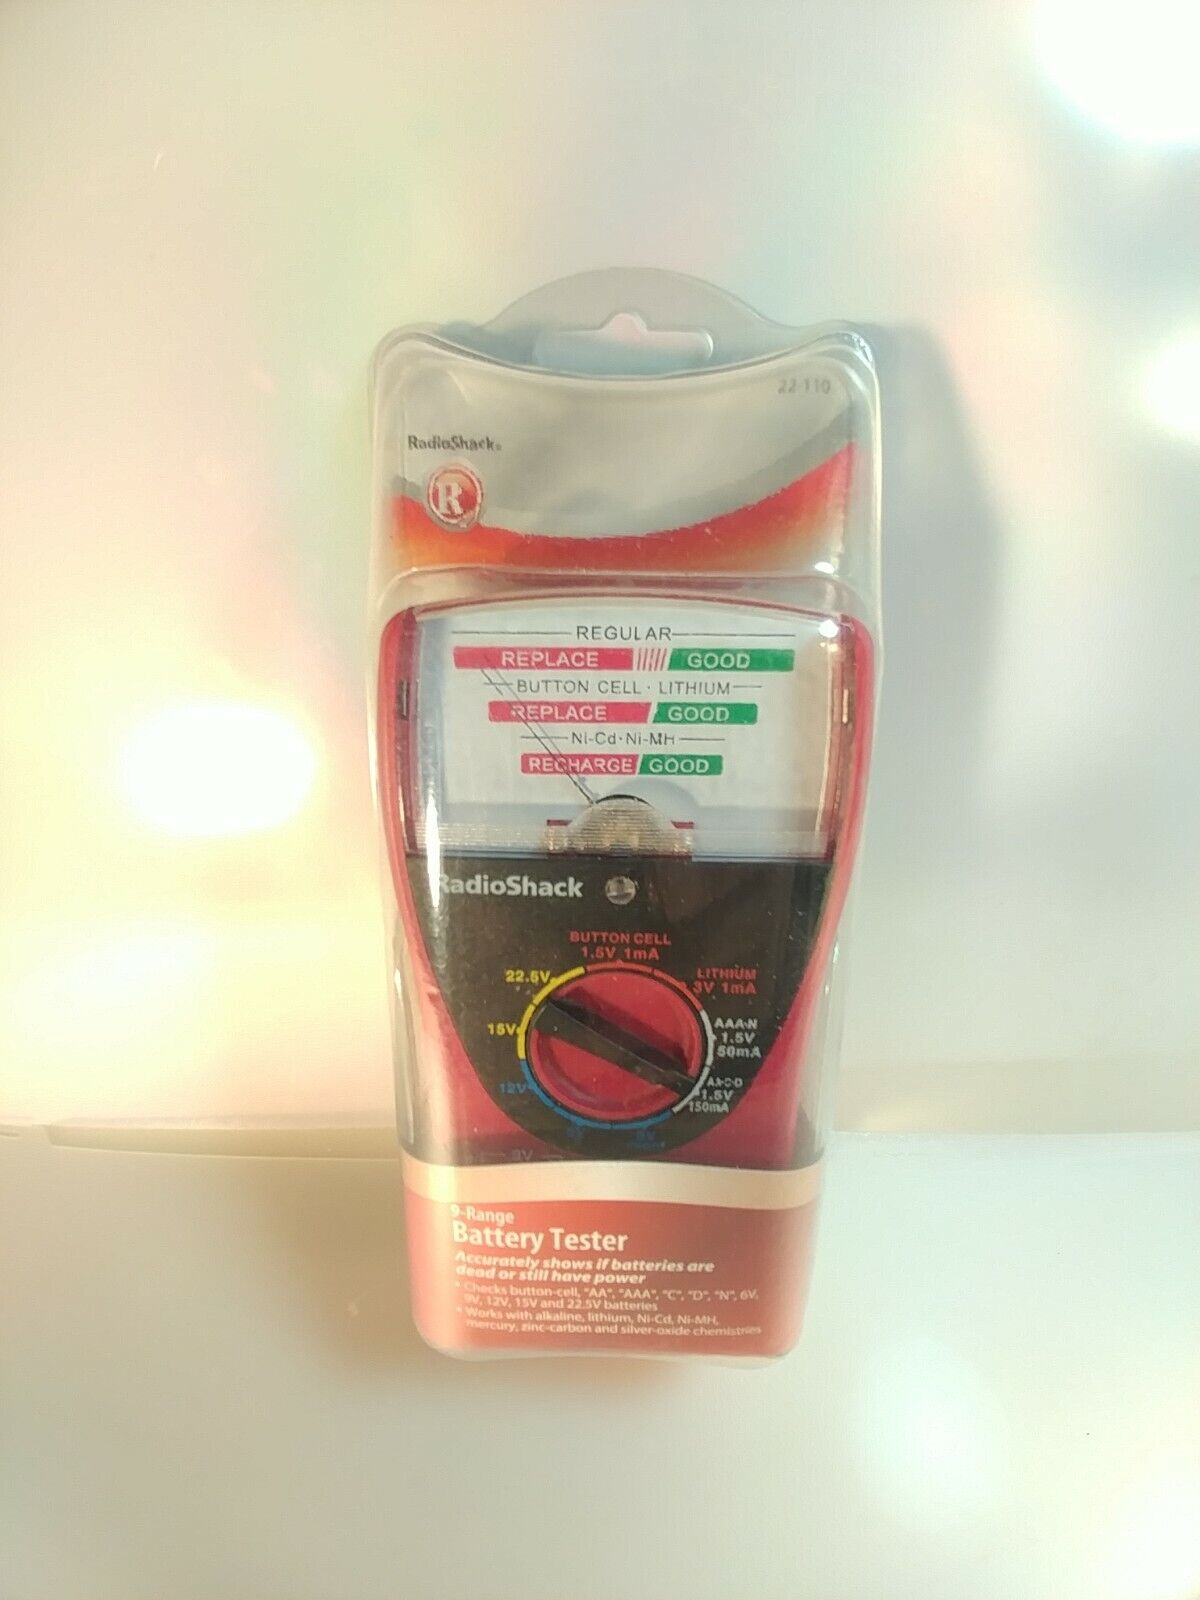 RadioShack 9 Range Battery Tester Radio Shack 22-110 Complete